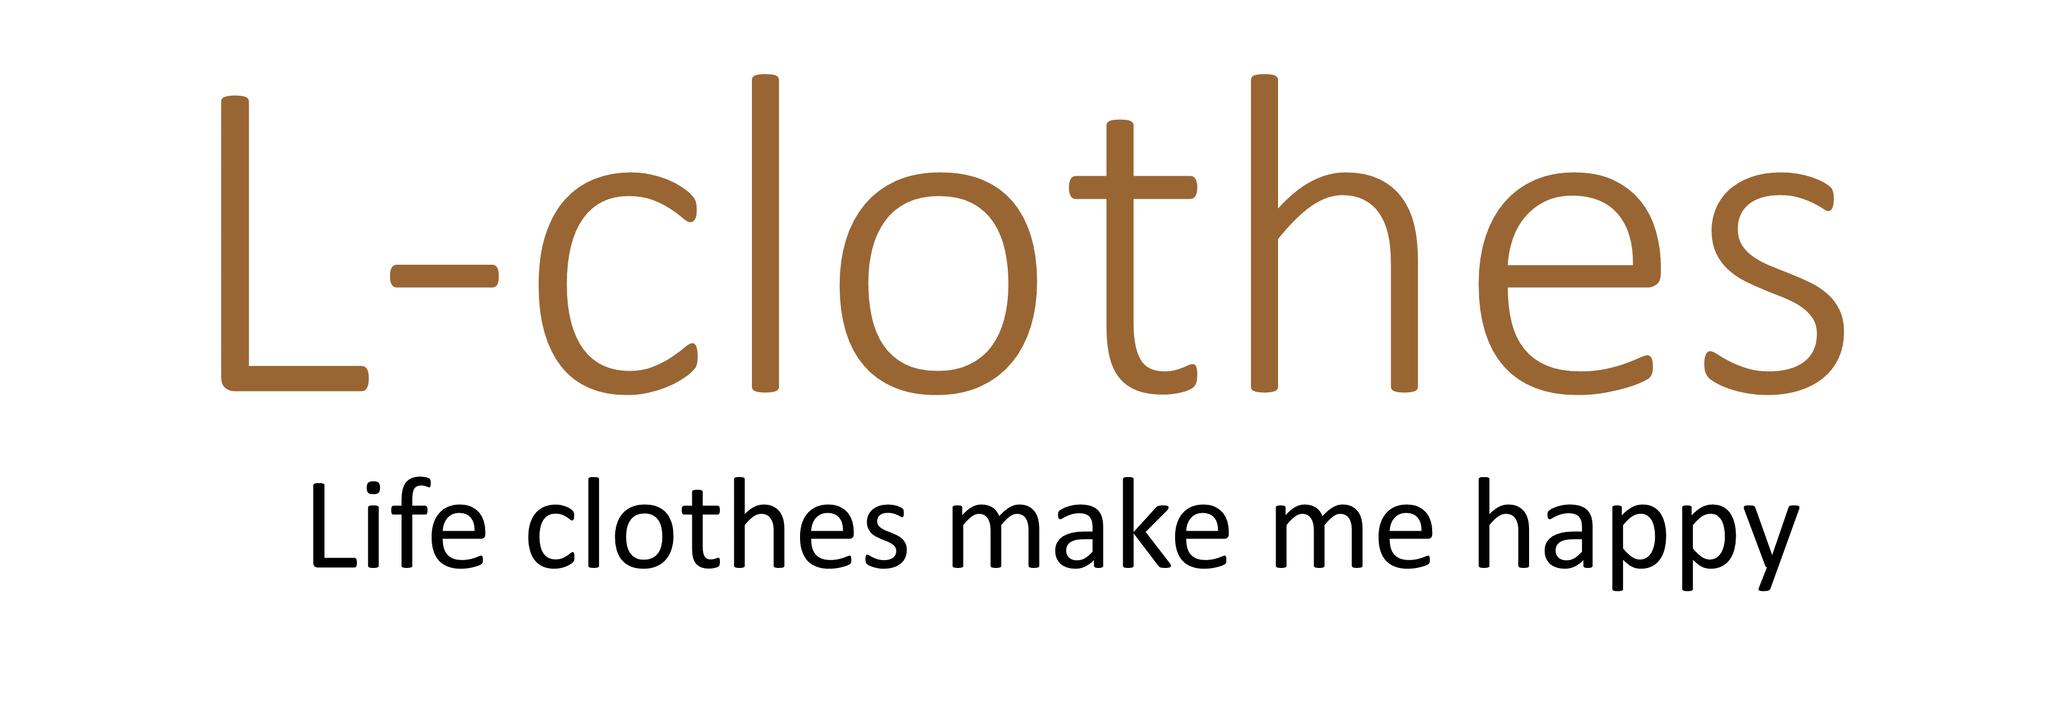 L-clothes | 毎日が楽しくなるfashion brand